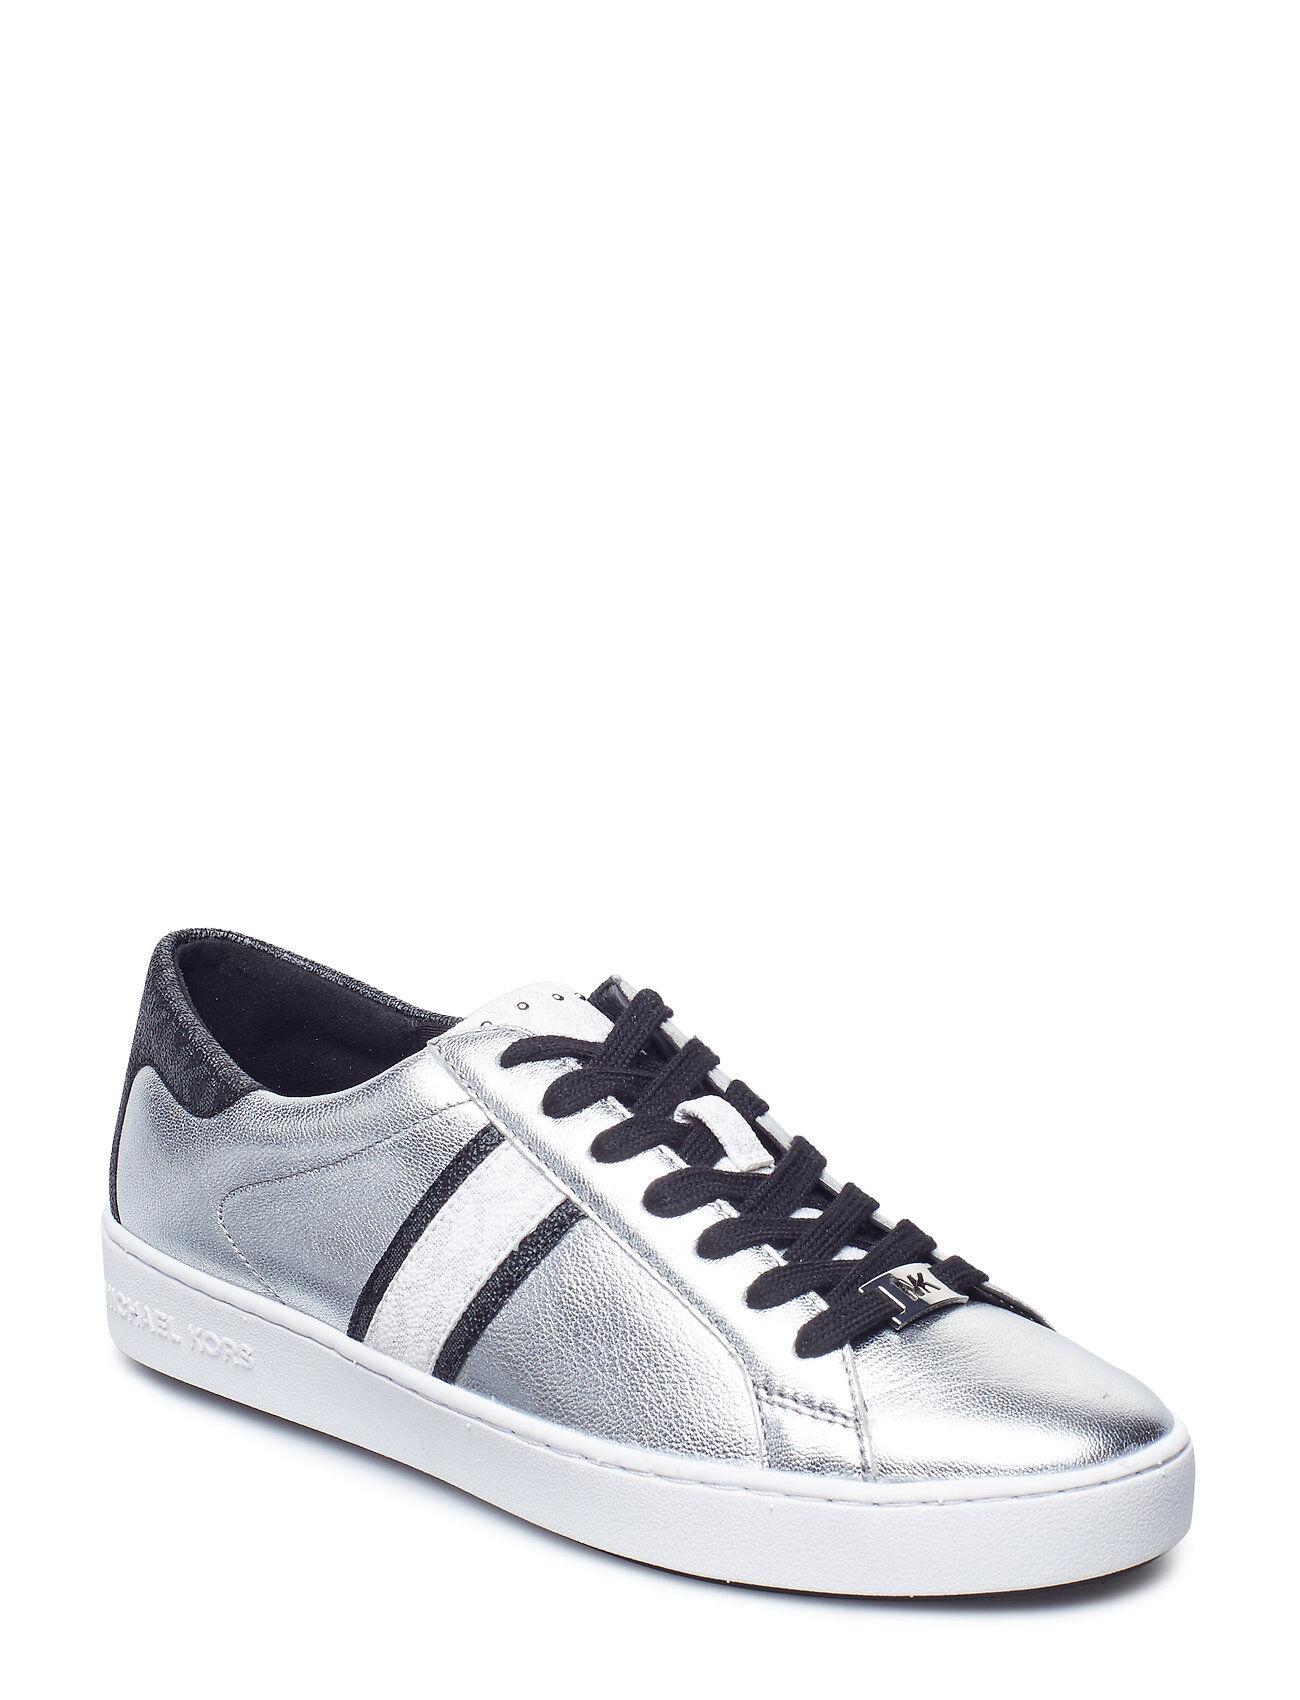 Michael Kors Shoes Keaton Stripe Sneaker